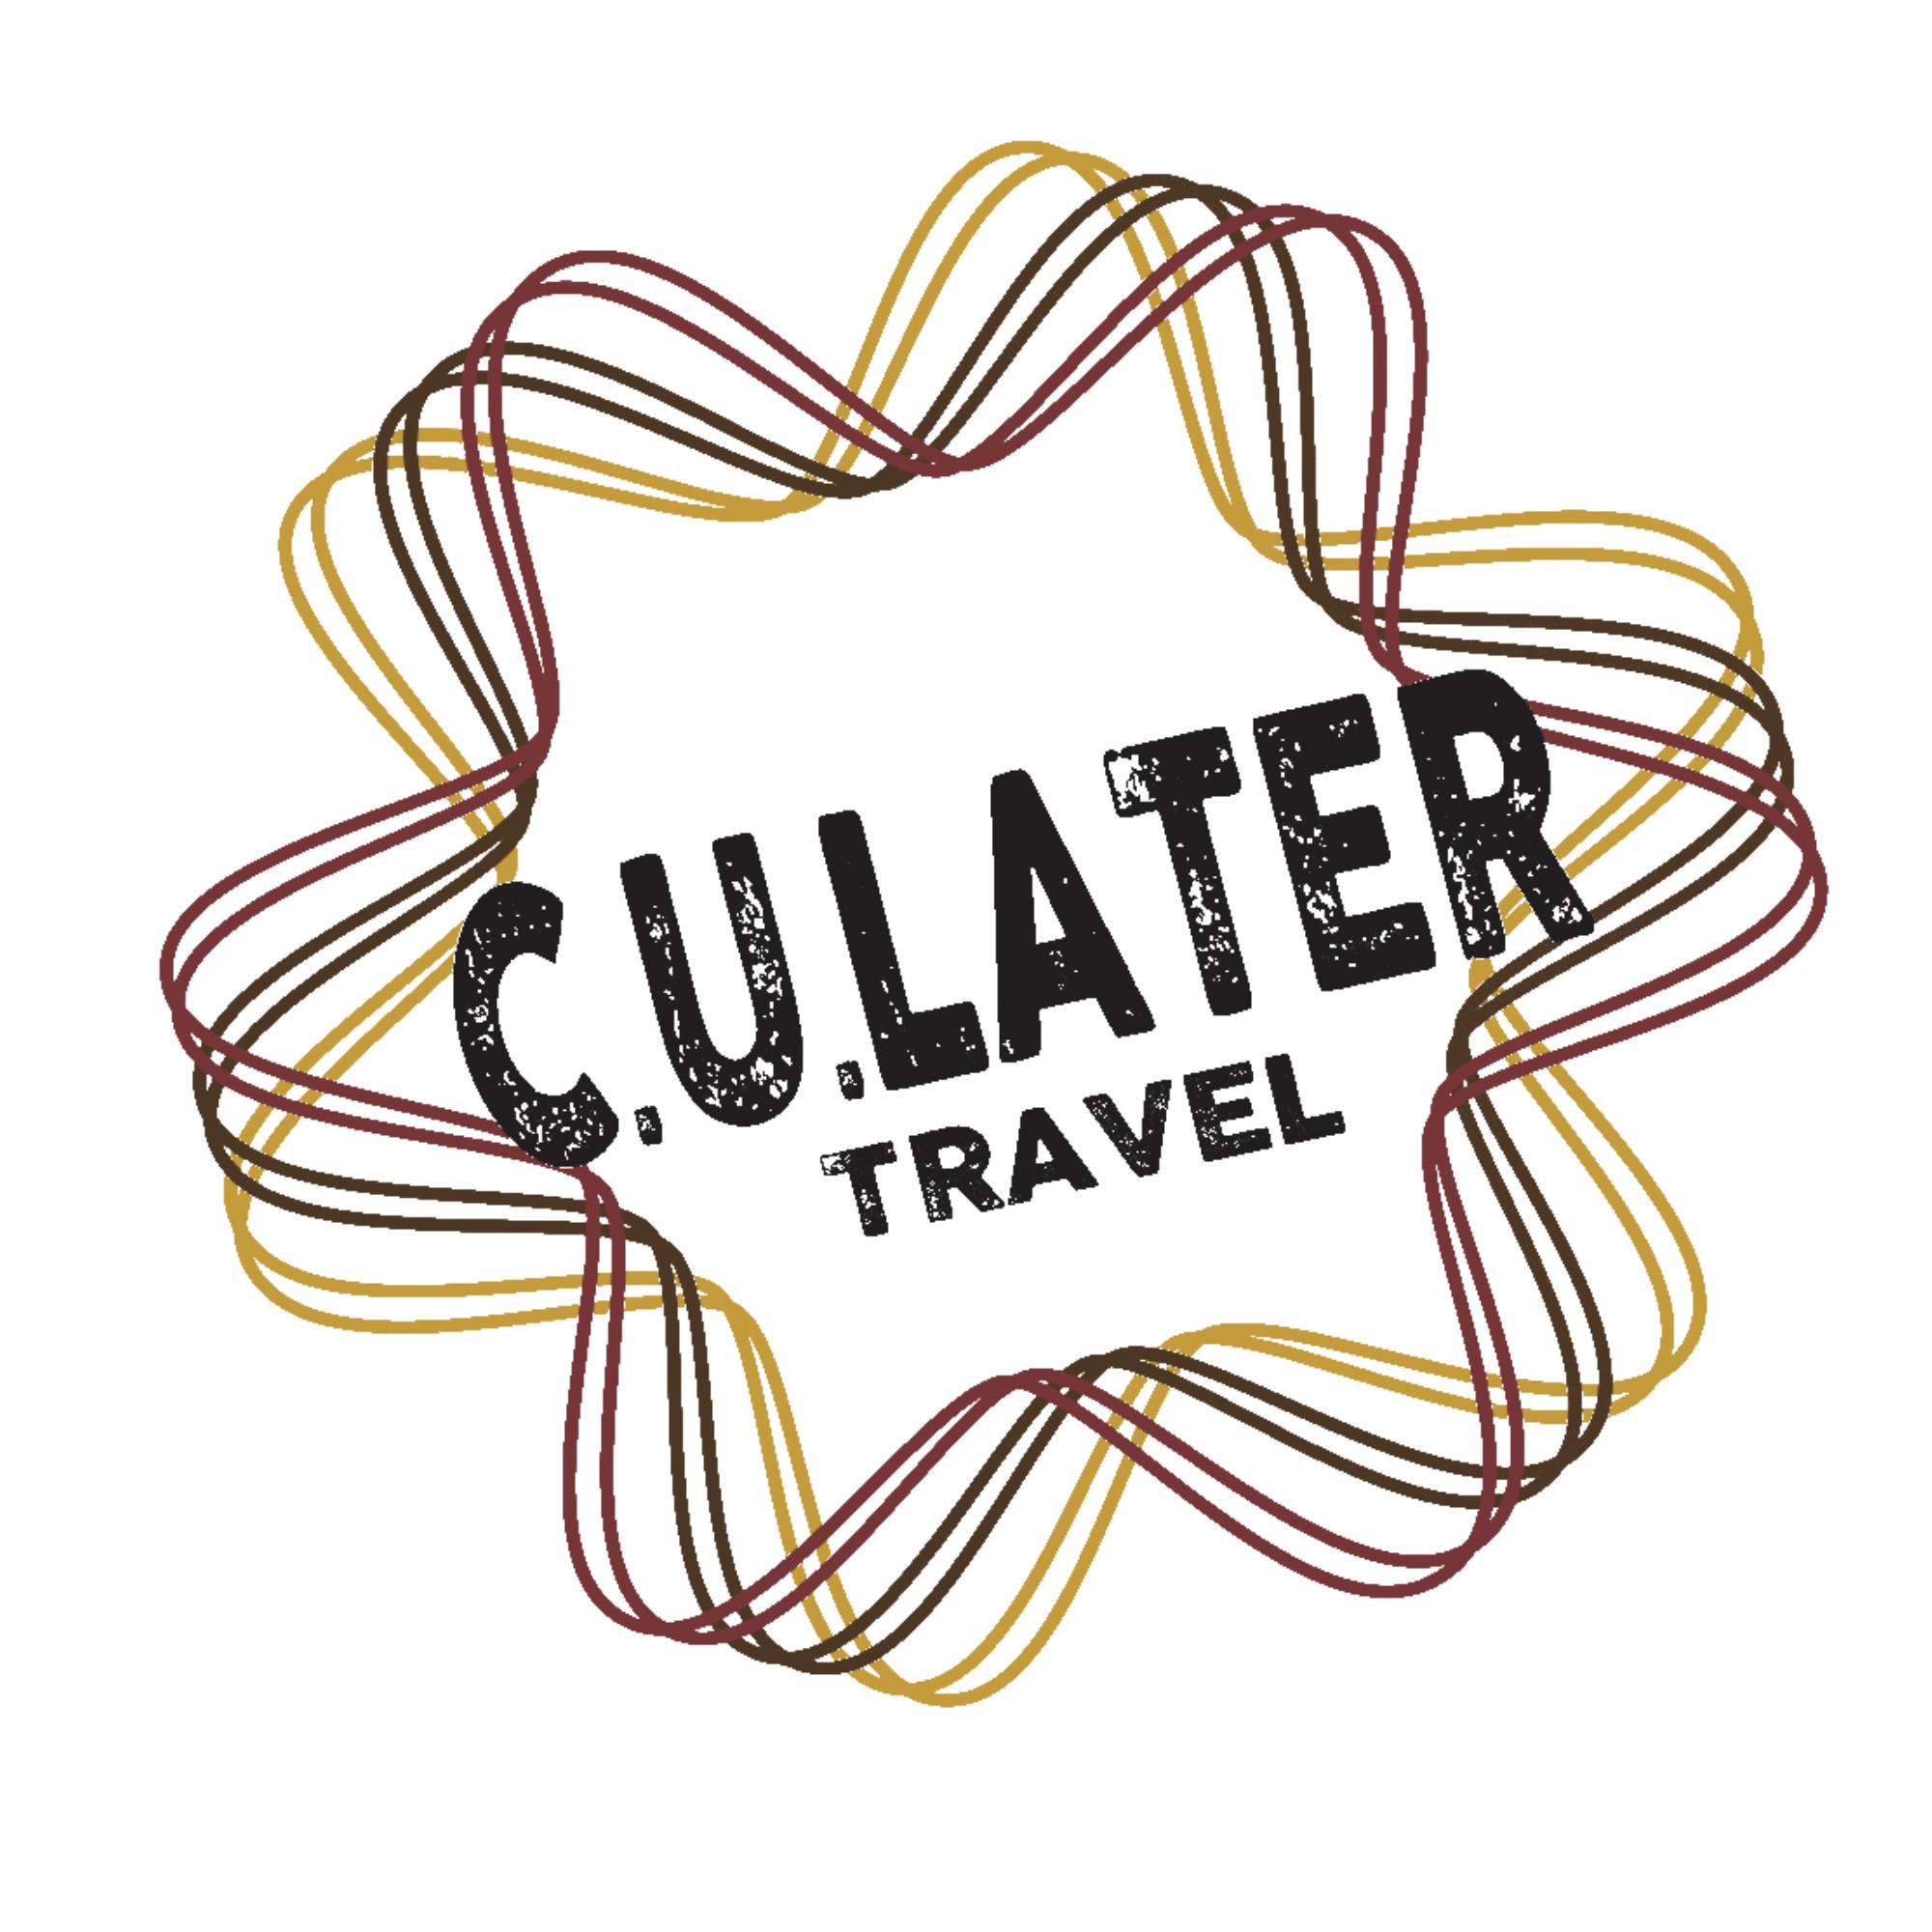 C U Later Travel, CA, USA